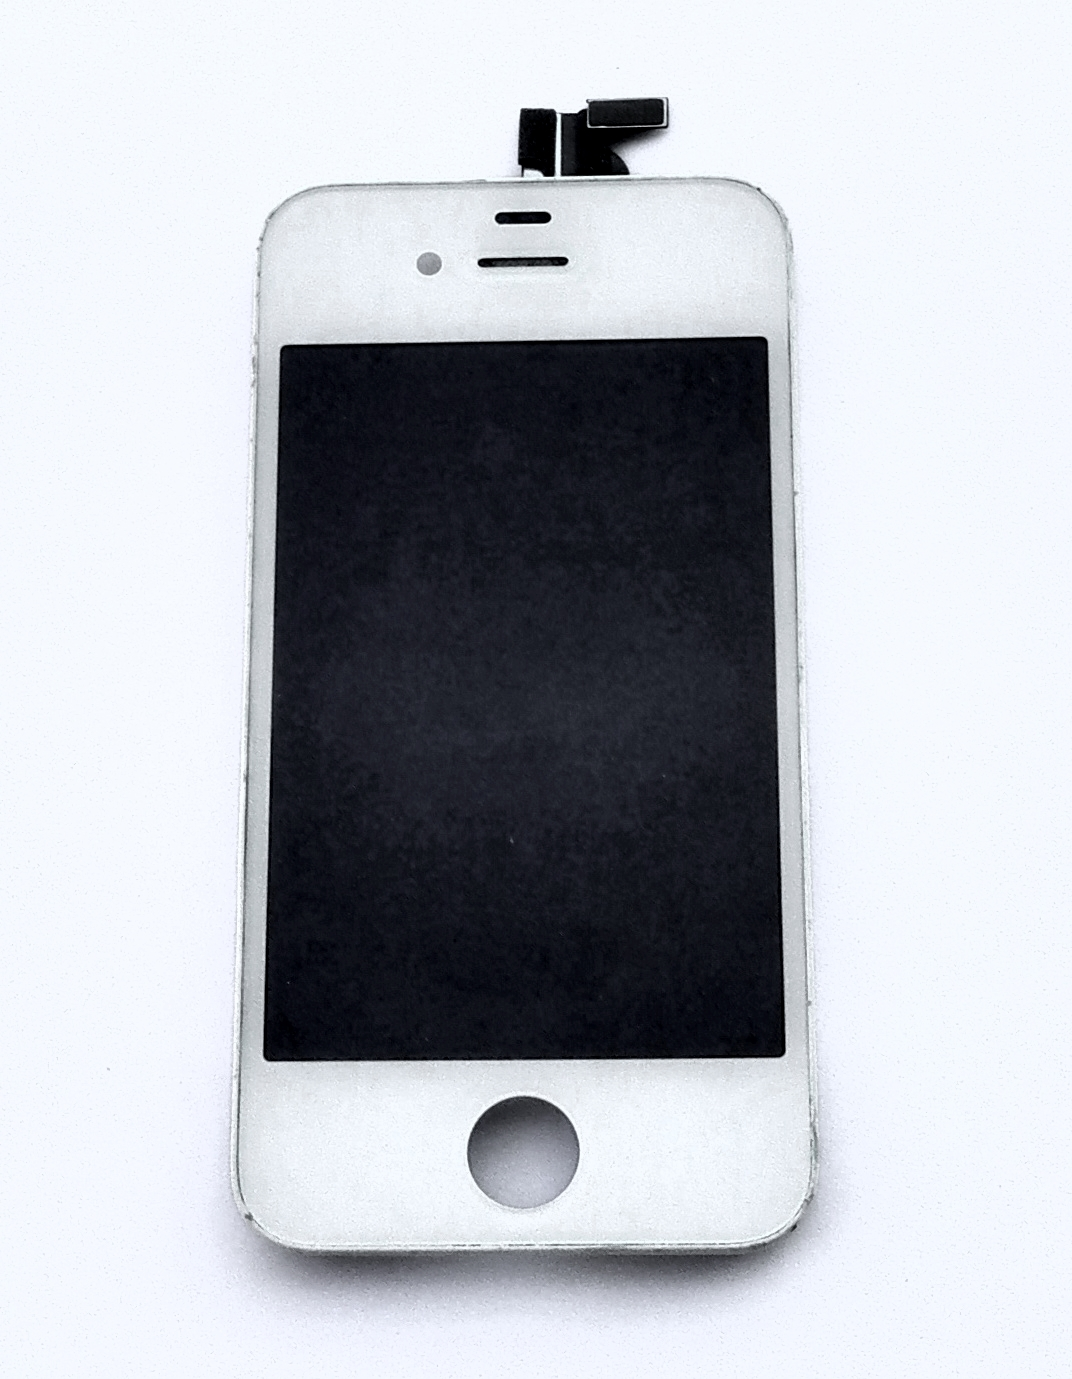 LCD displej iPhone 4 komplet bílý - použitý Display Apple iPhone 4 včerně rámečku a skla